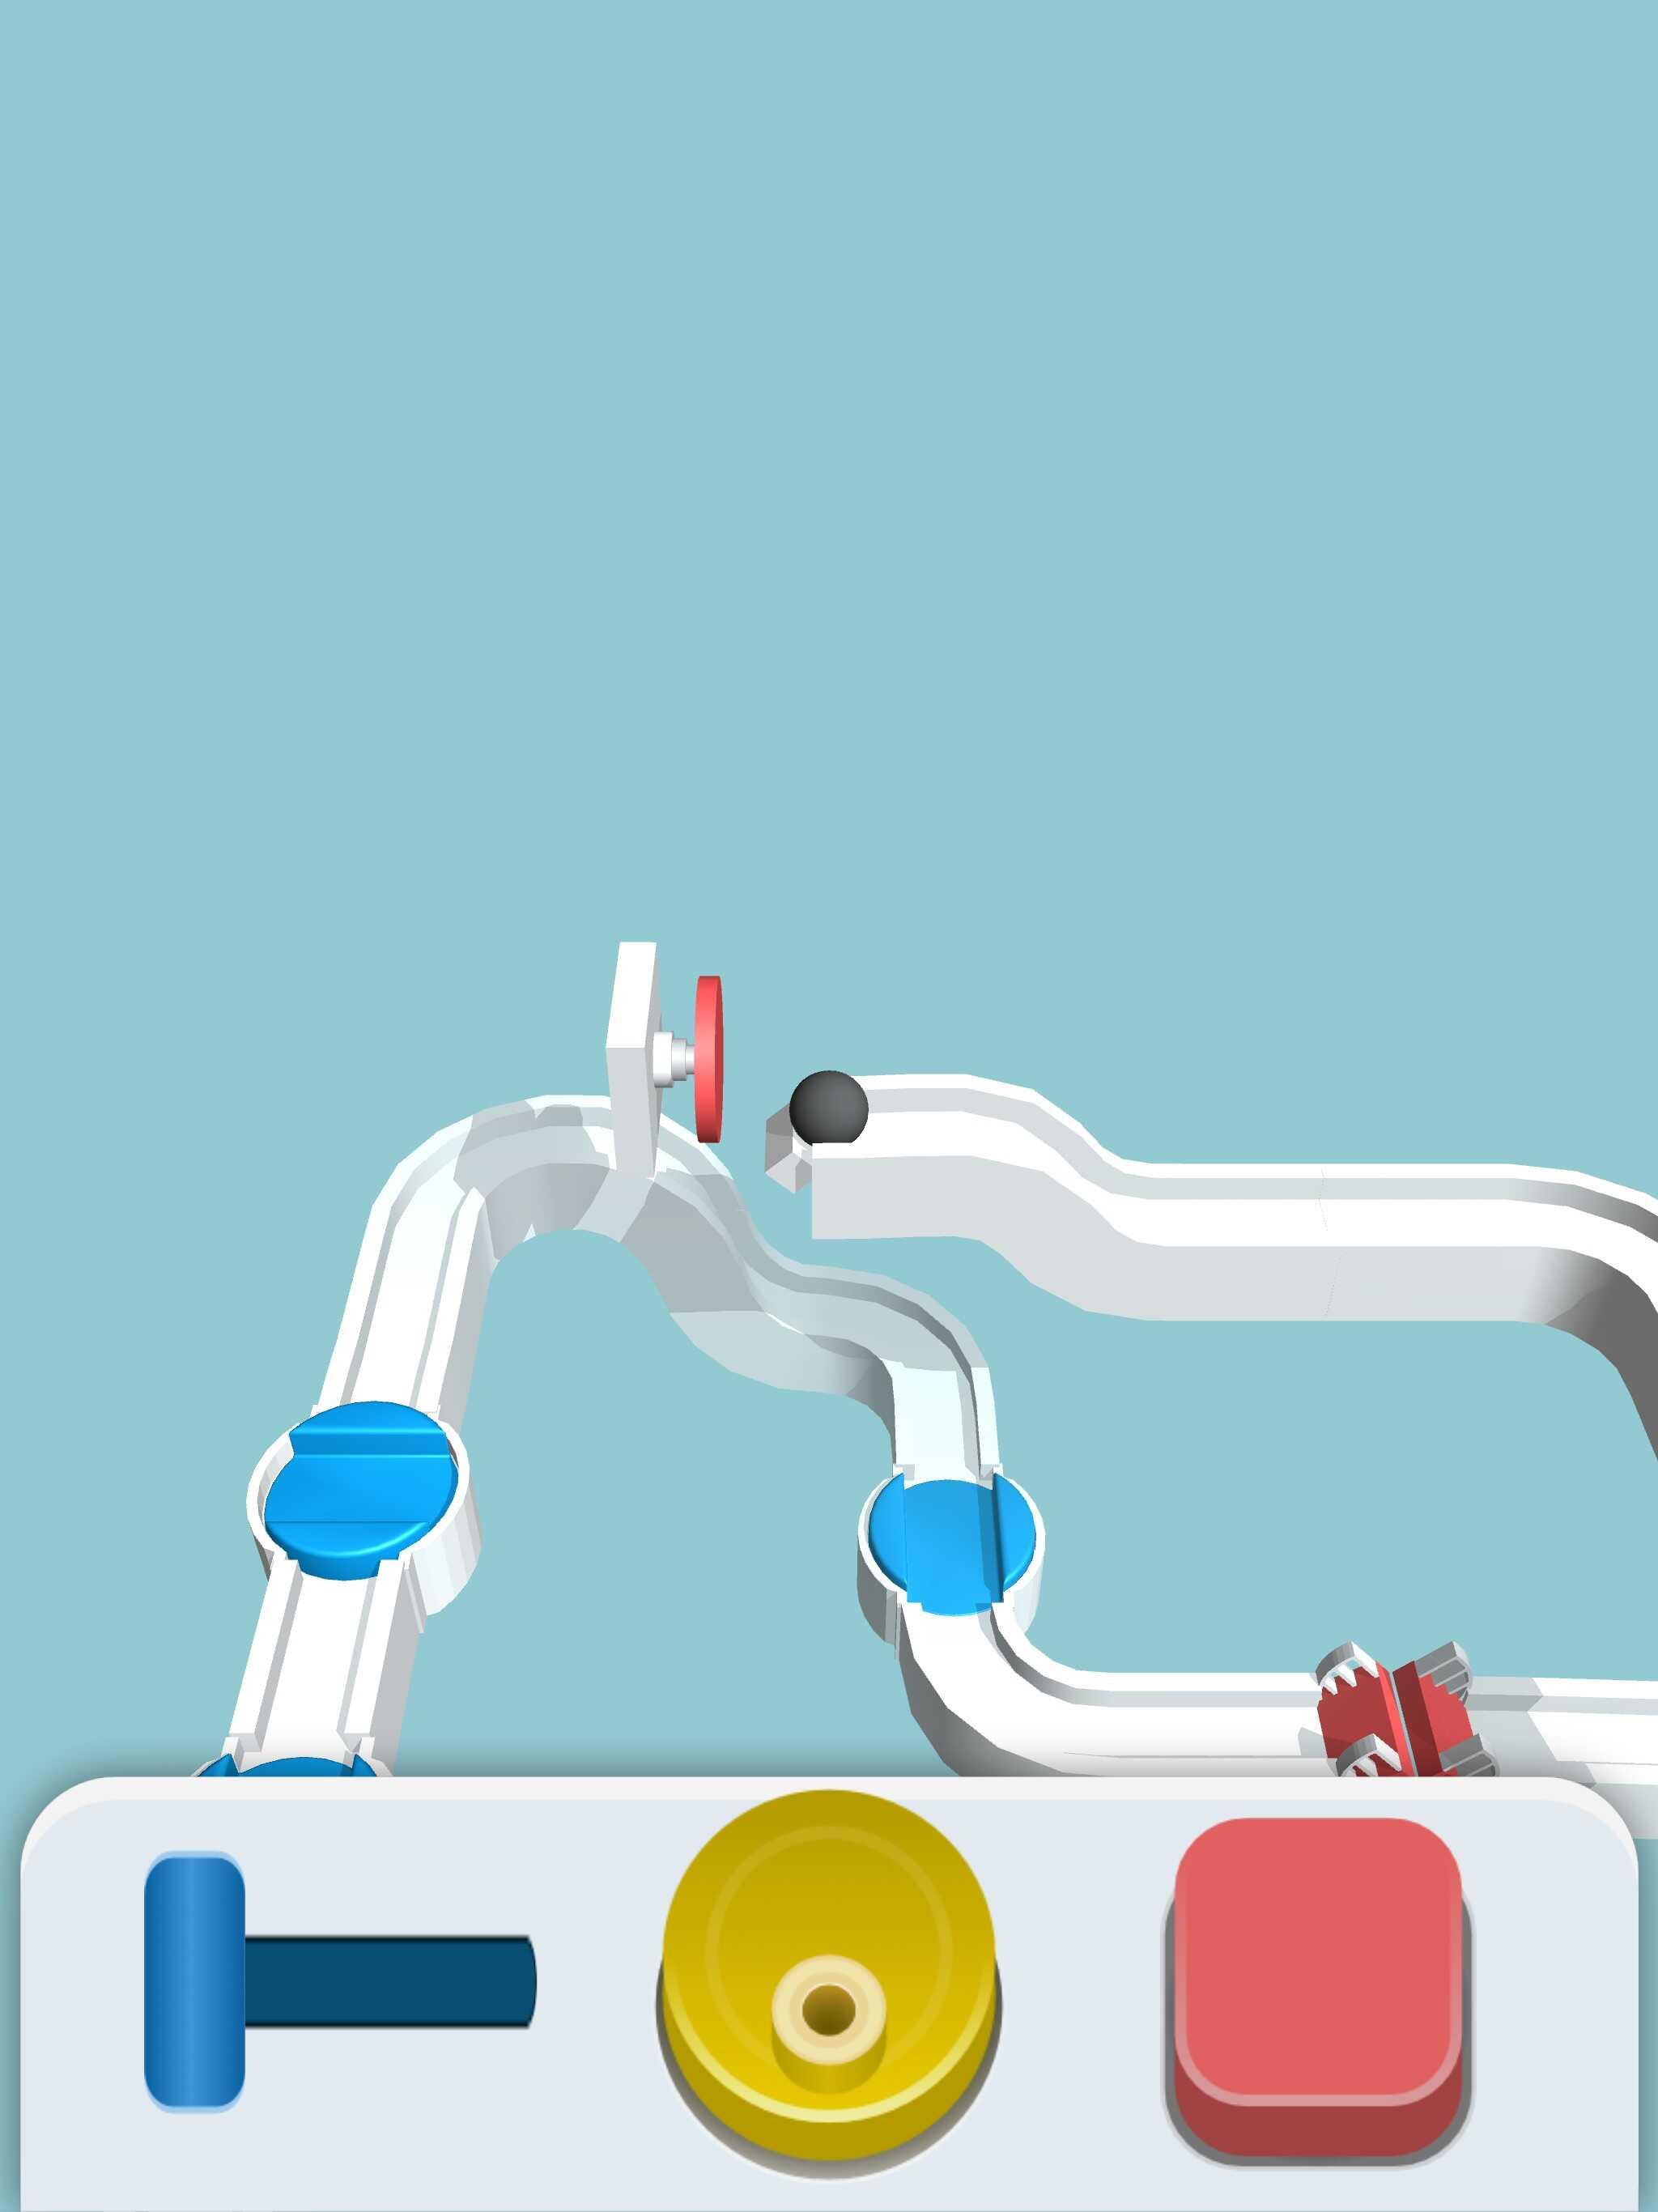 Ball Slider 3Dで遊んでみた感想とレビュー